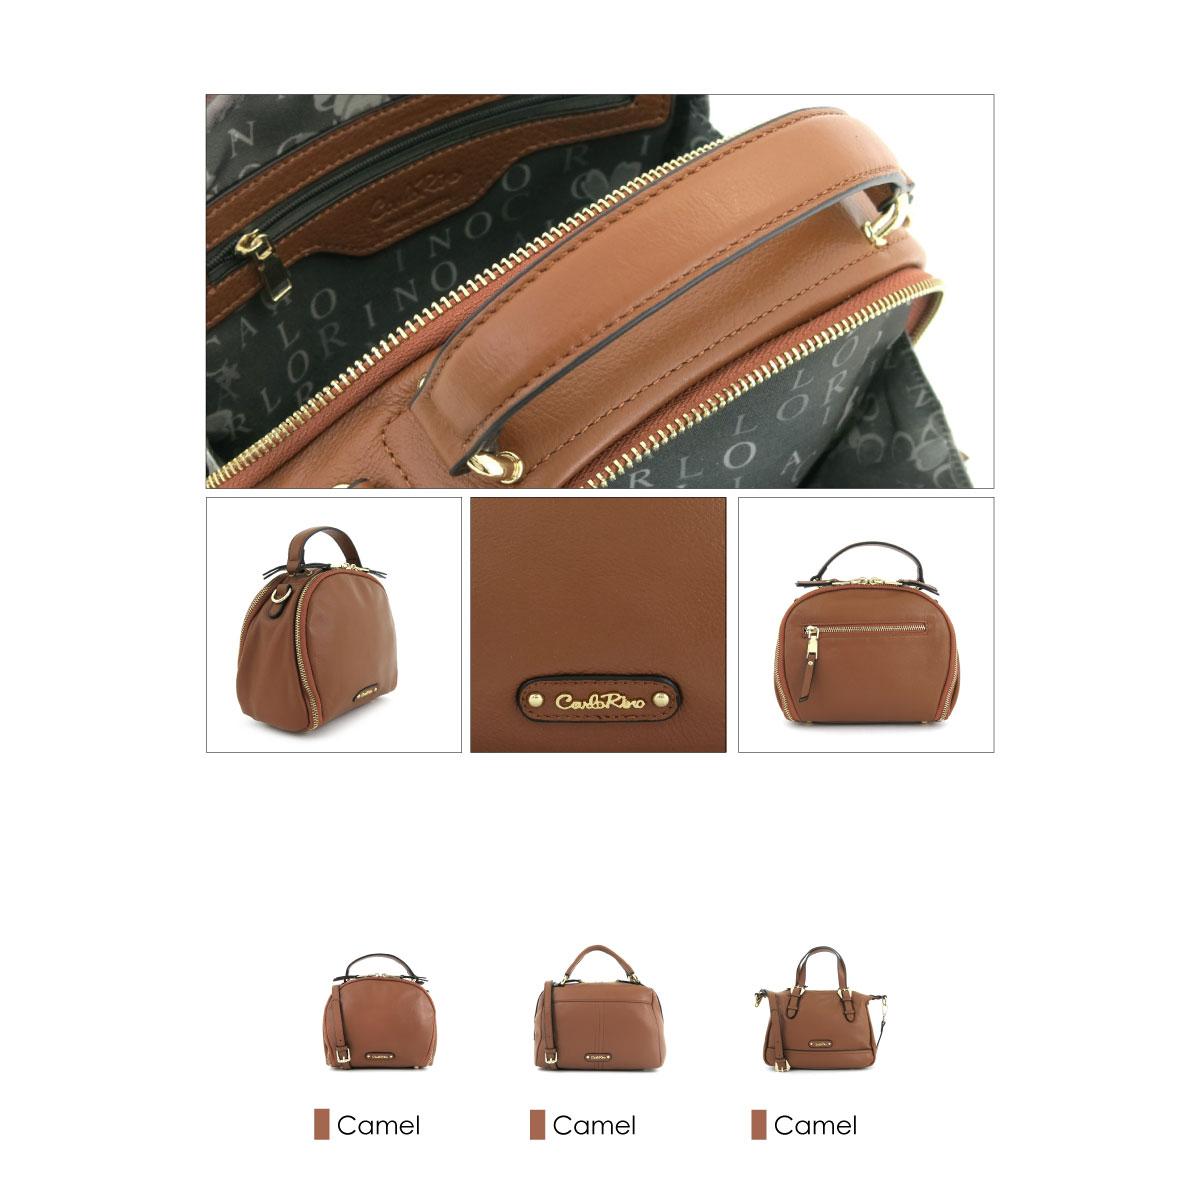 0304875F 001 35 03 - Leather Bash Round Zip-around Cross Body